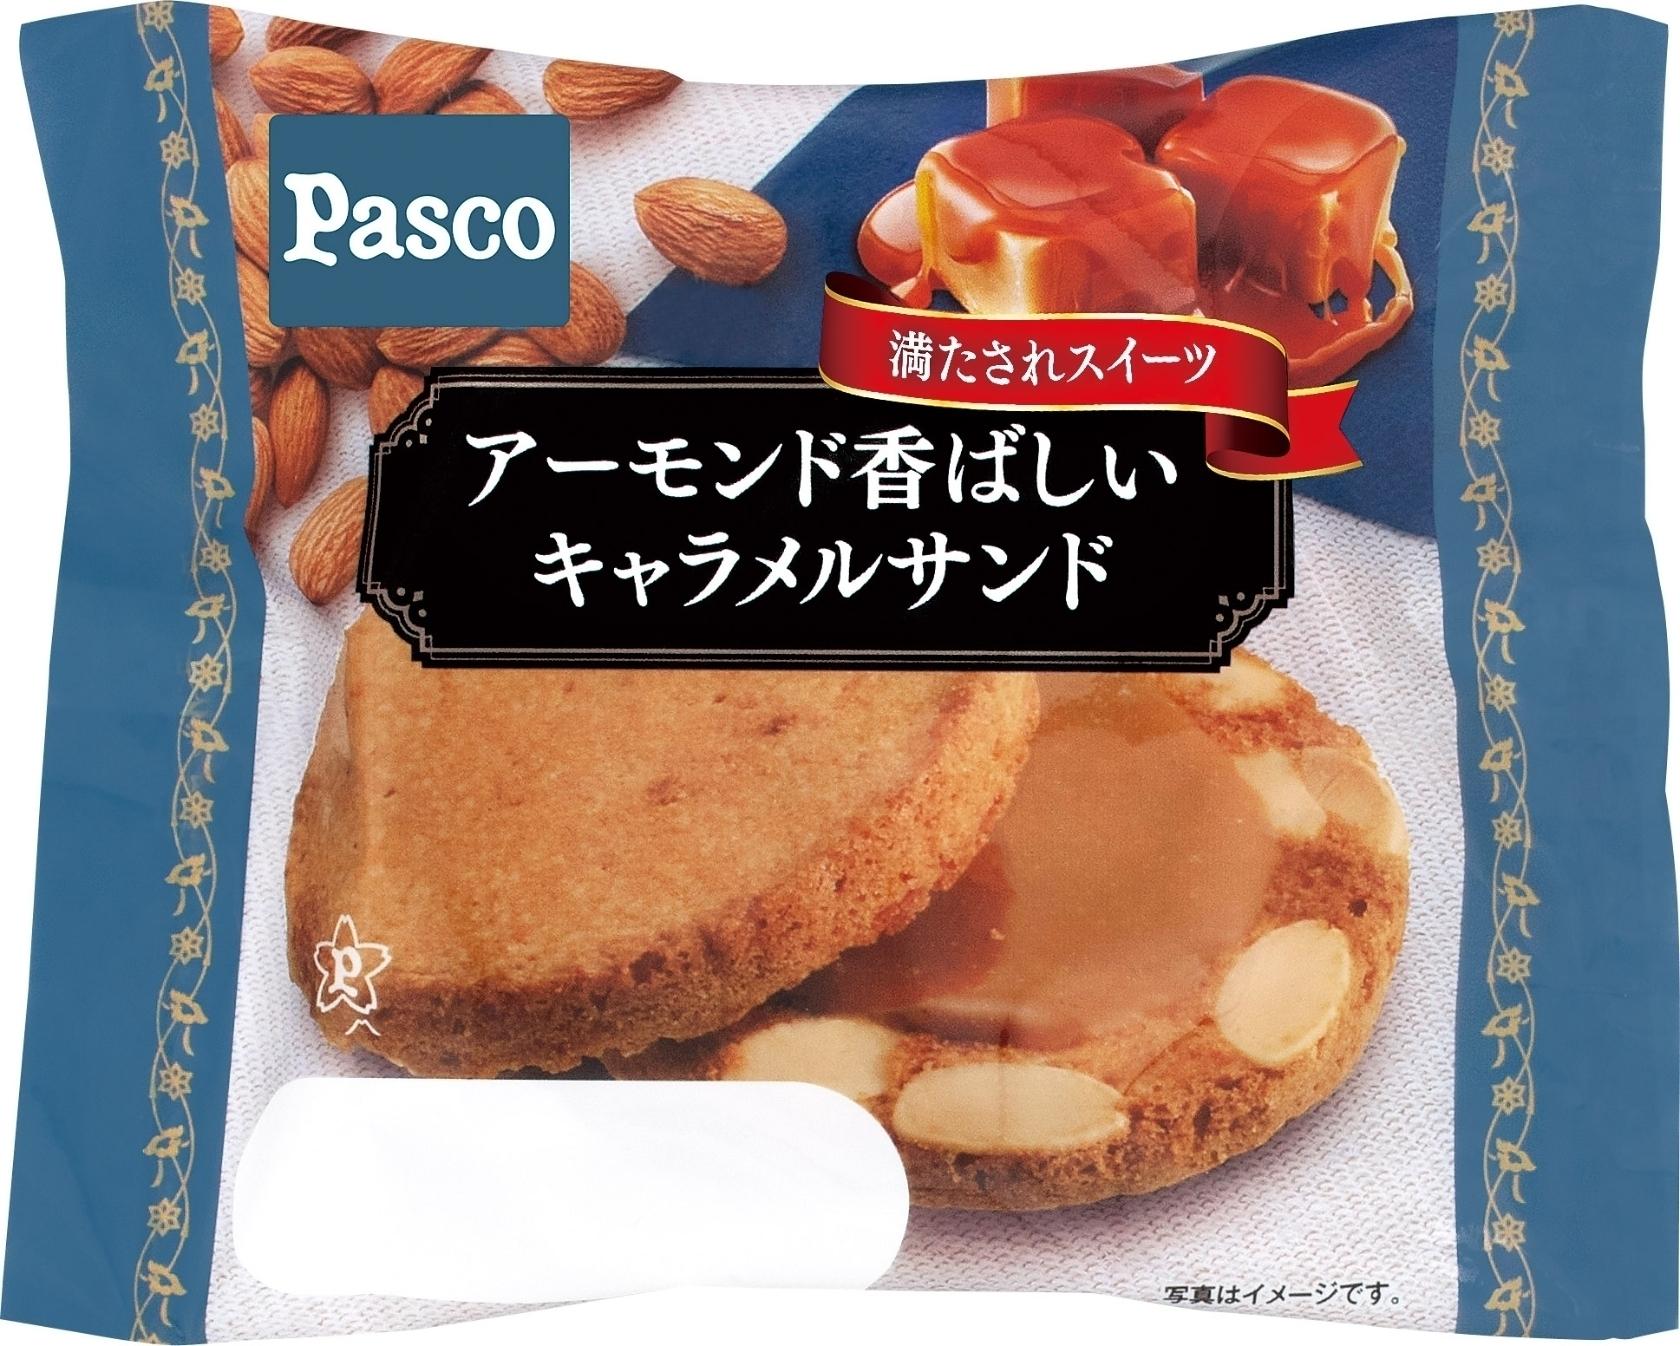 Pasco アーモンド香ばしいキャラメルサンド 袋1個